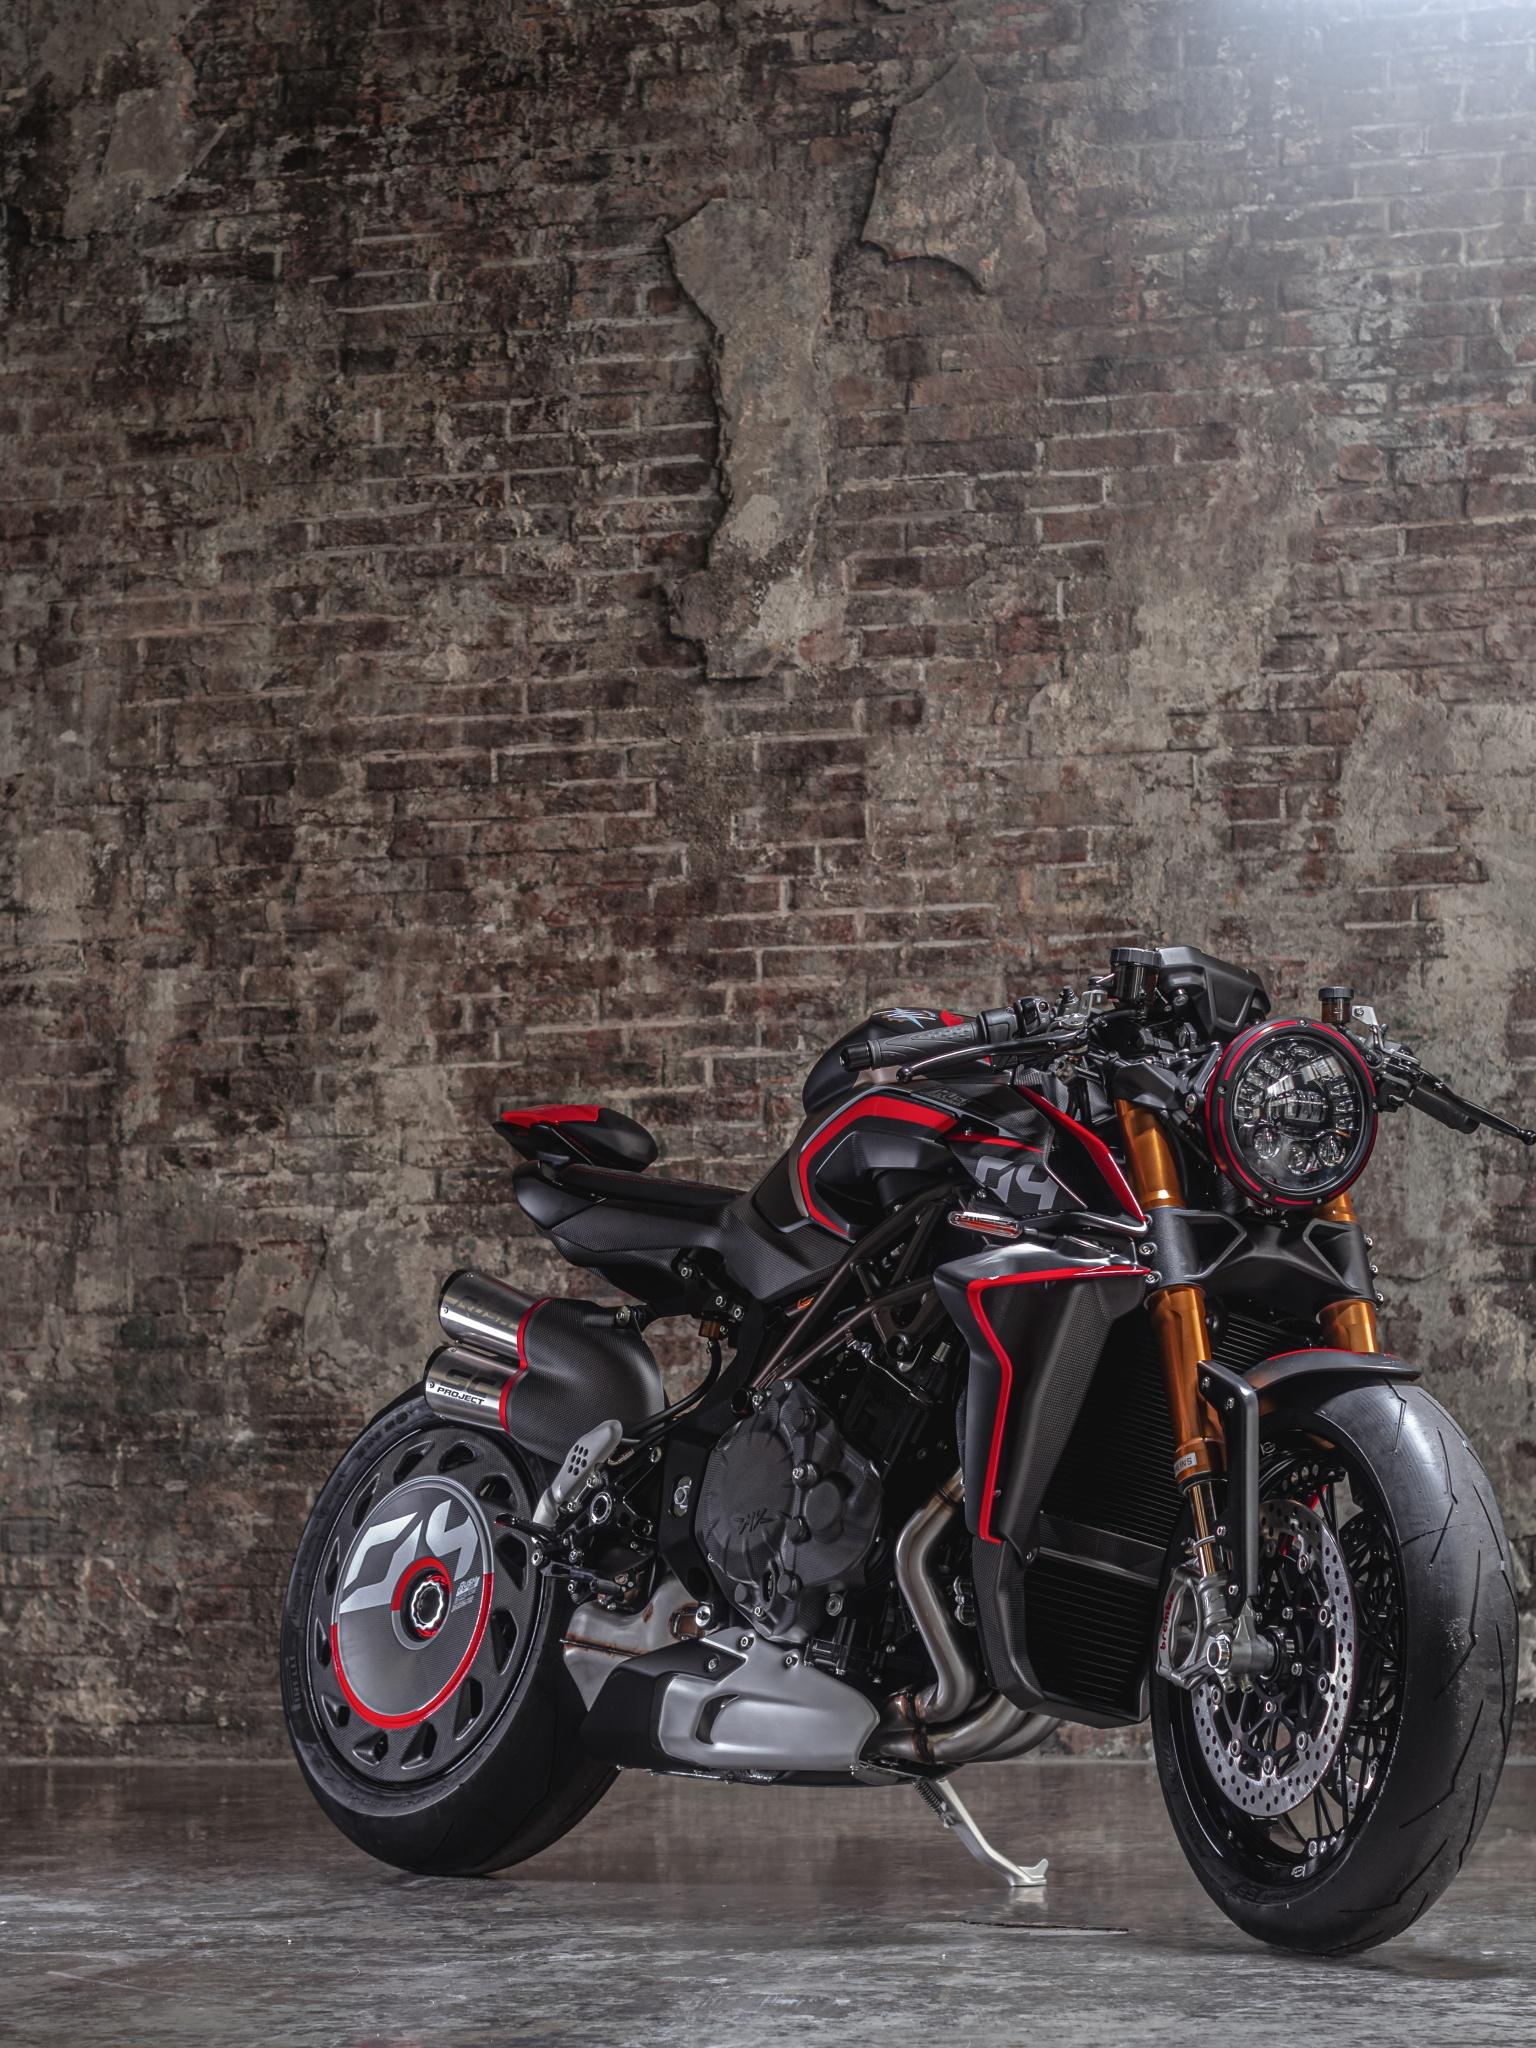 Mv Agusta Rush 1000 Wallpaper 4k 2020 5k Bikes 1264